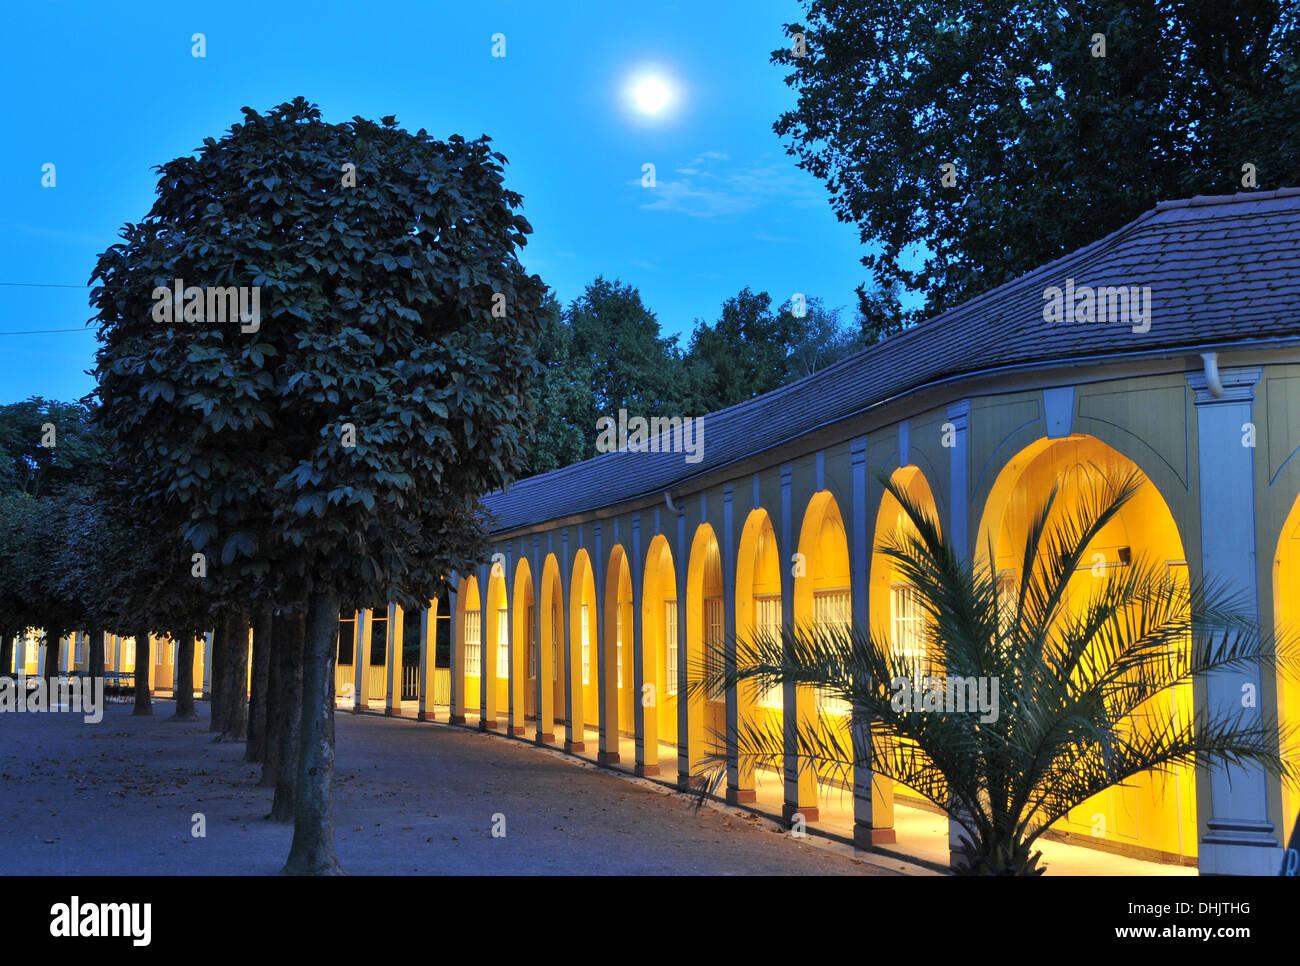 Illuminated arcades at the Kurpark at night, Bad Lauchstaedt, Saxony-Anhalt, Germany, Europe Stock Photo